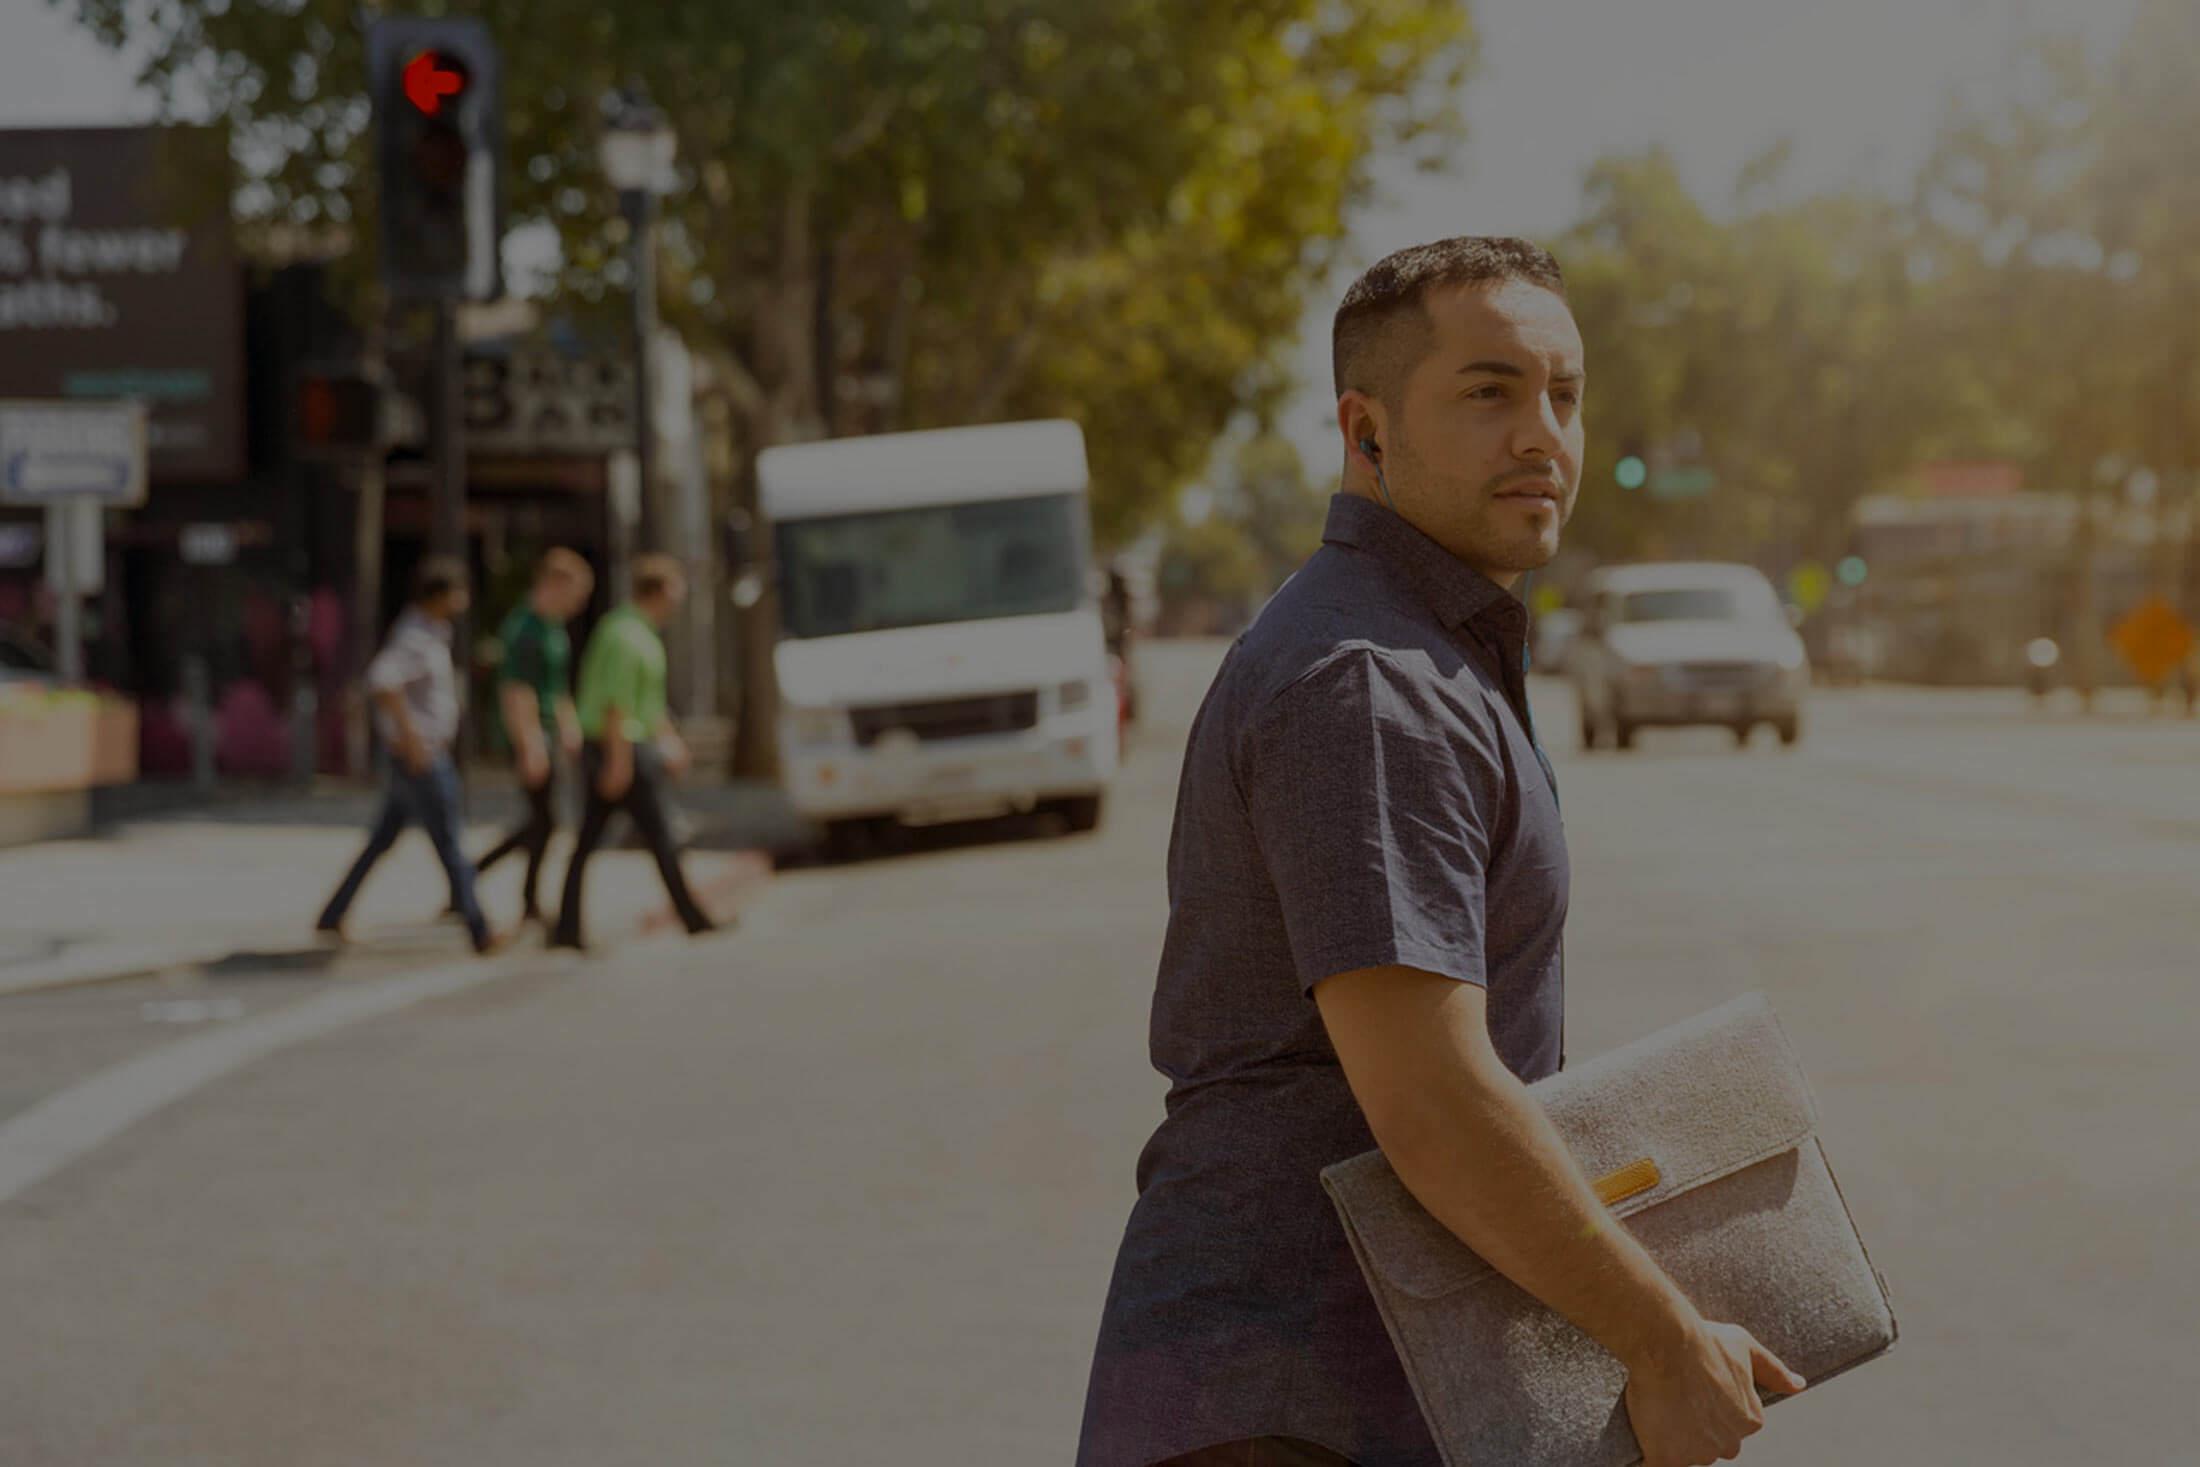 Pole emploi - offre emploi Chauffeur citerne adr (H/F) - Mayenne